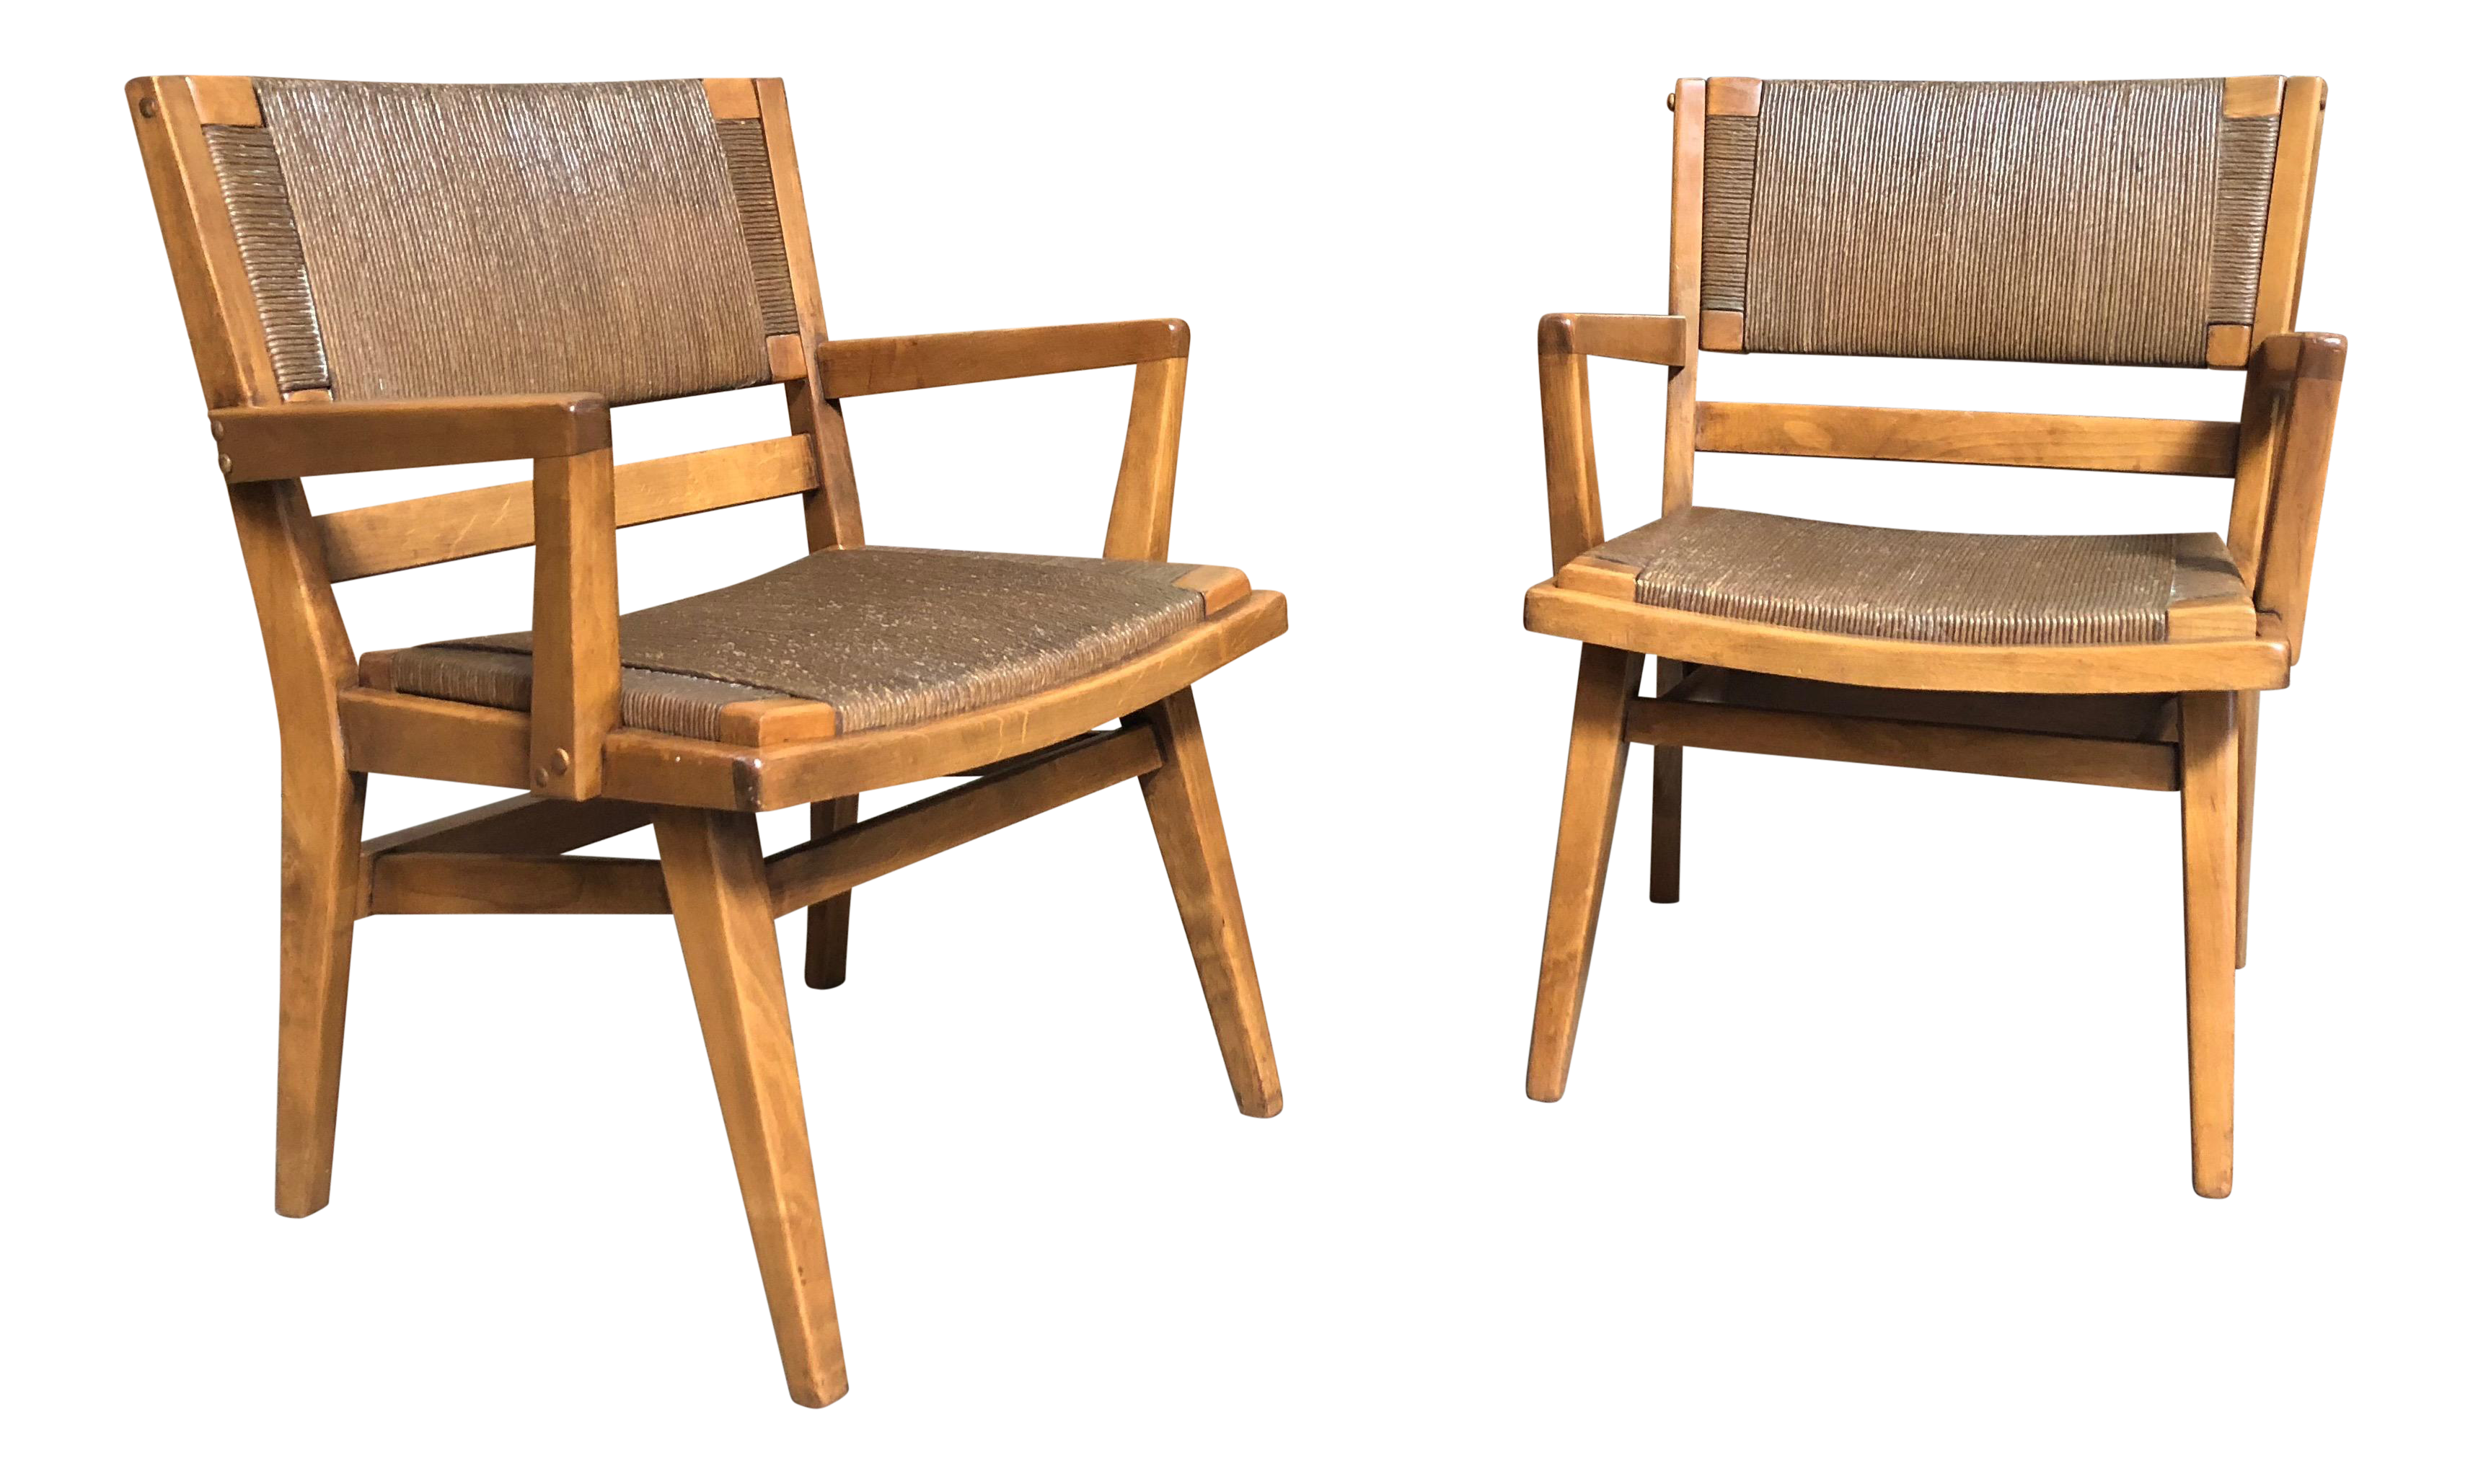 Mid century modern woven rush seat wooden arm chairs chairish